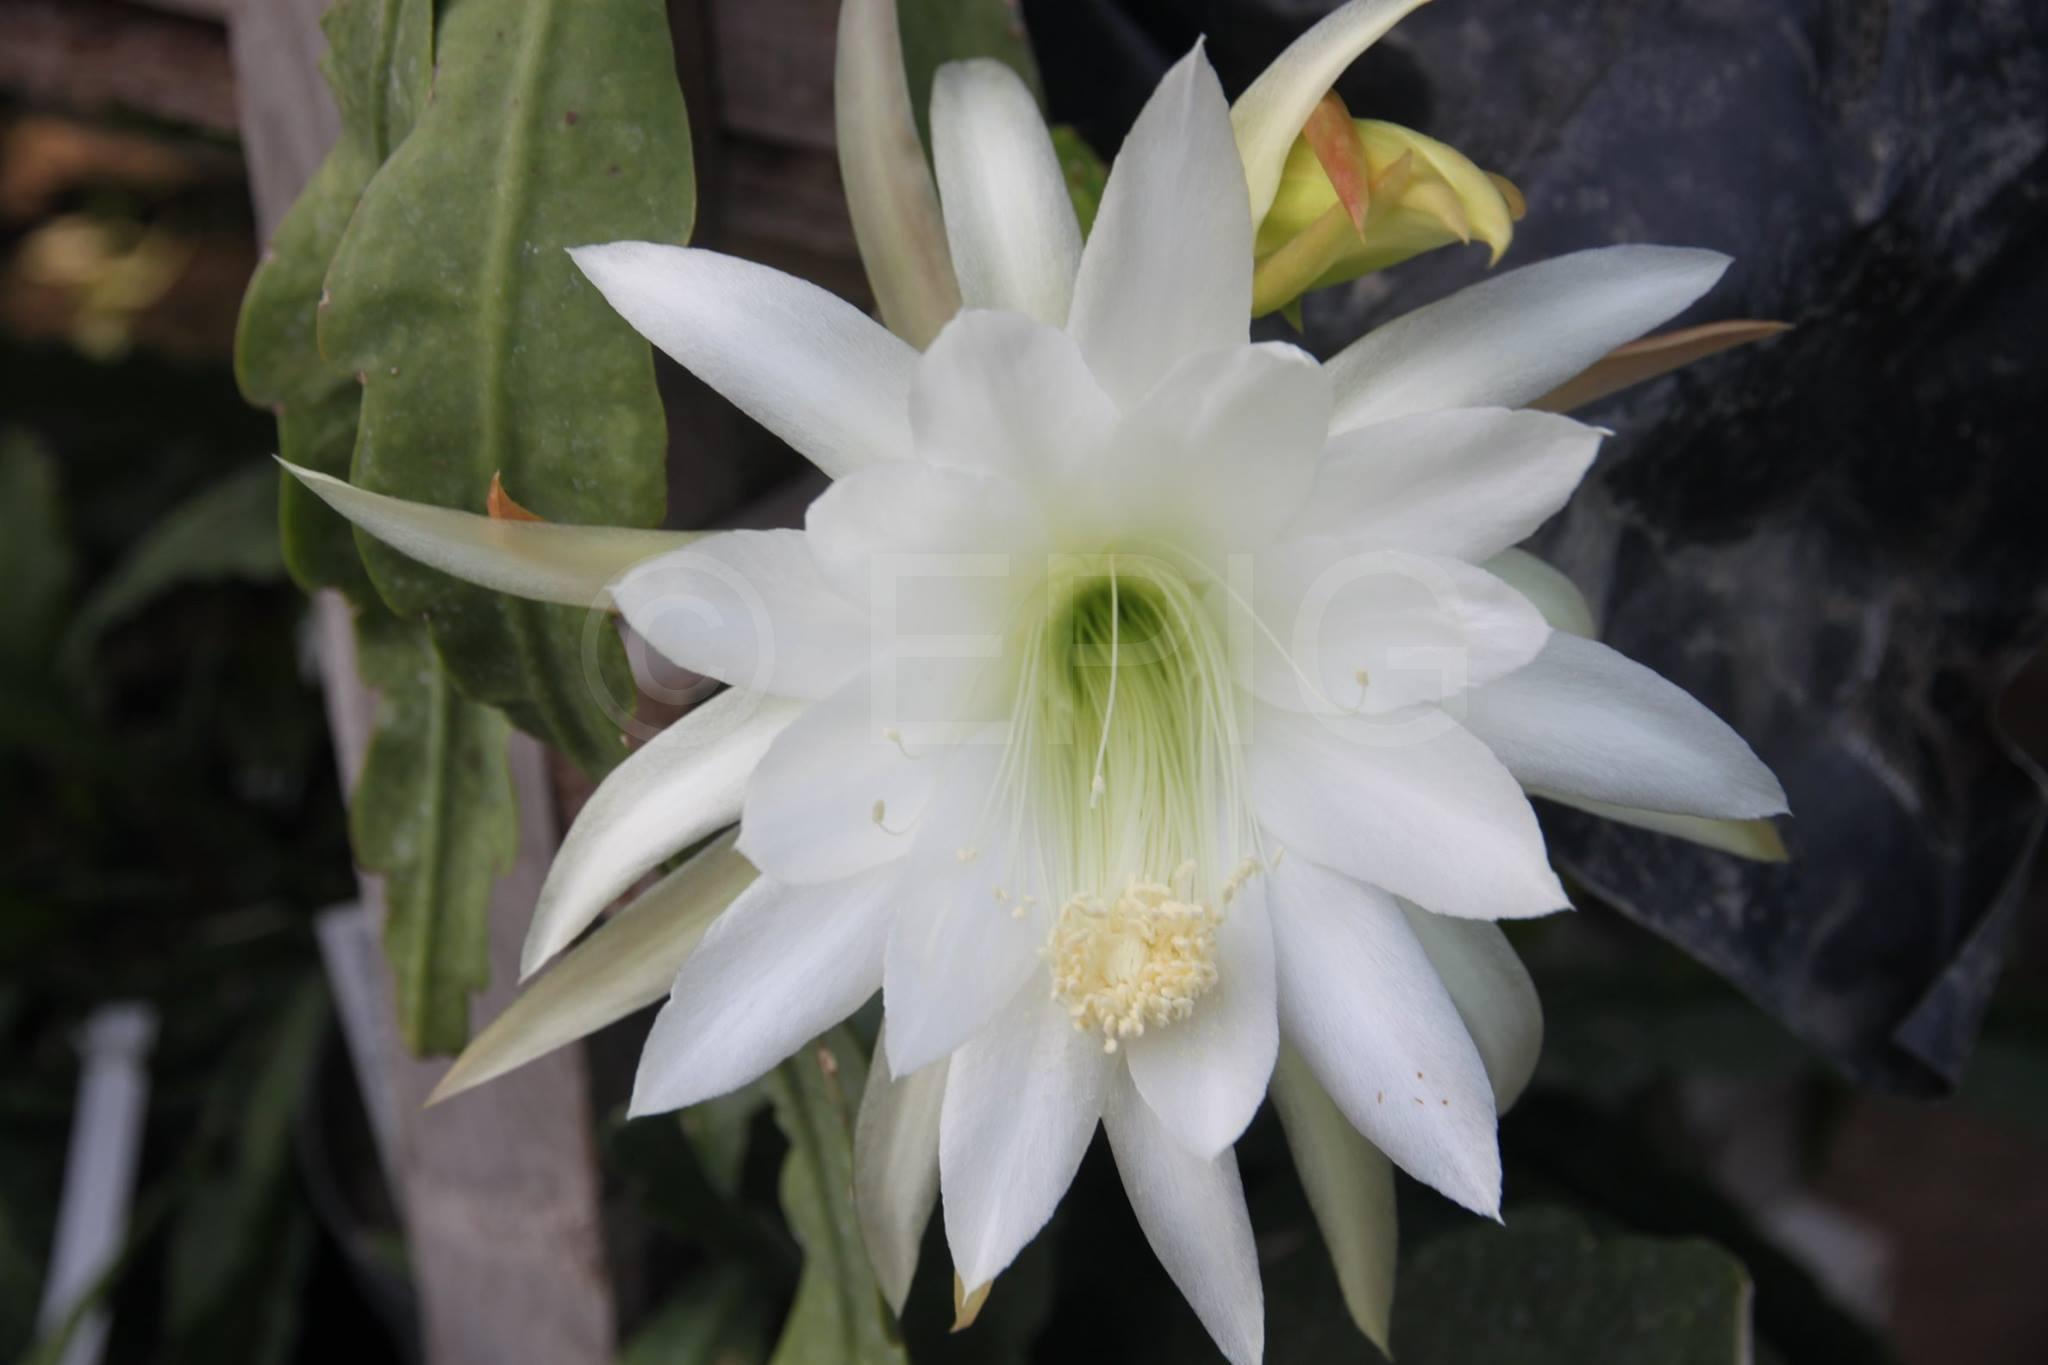 Epikaktus 'Gardenia' (Foto Heinz Peter Mohrdieck)